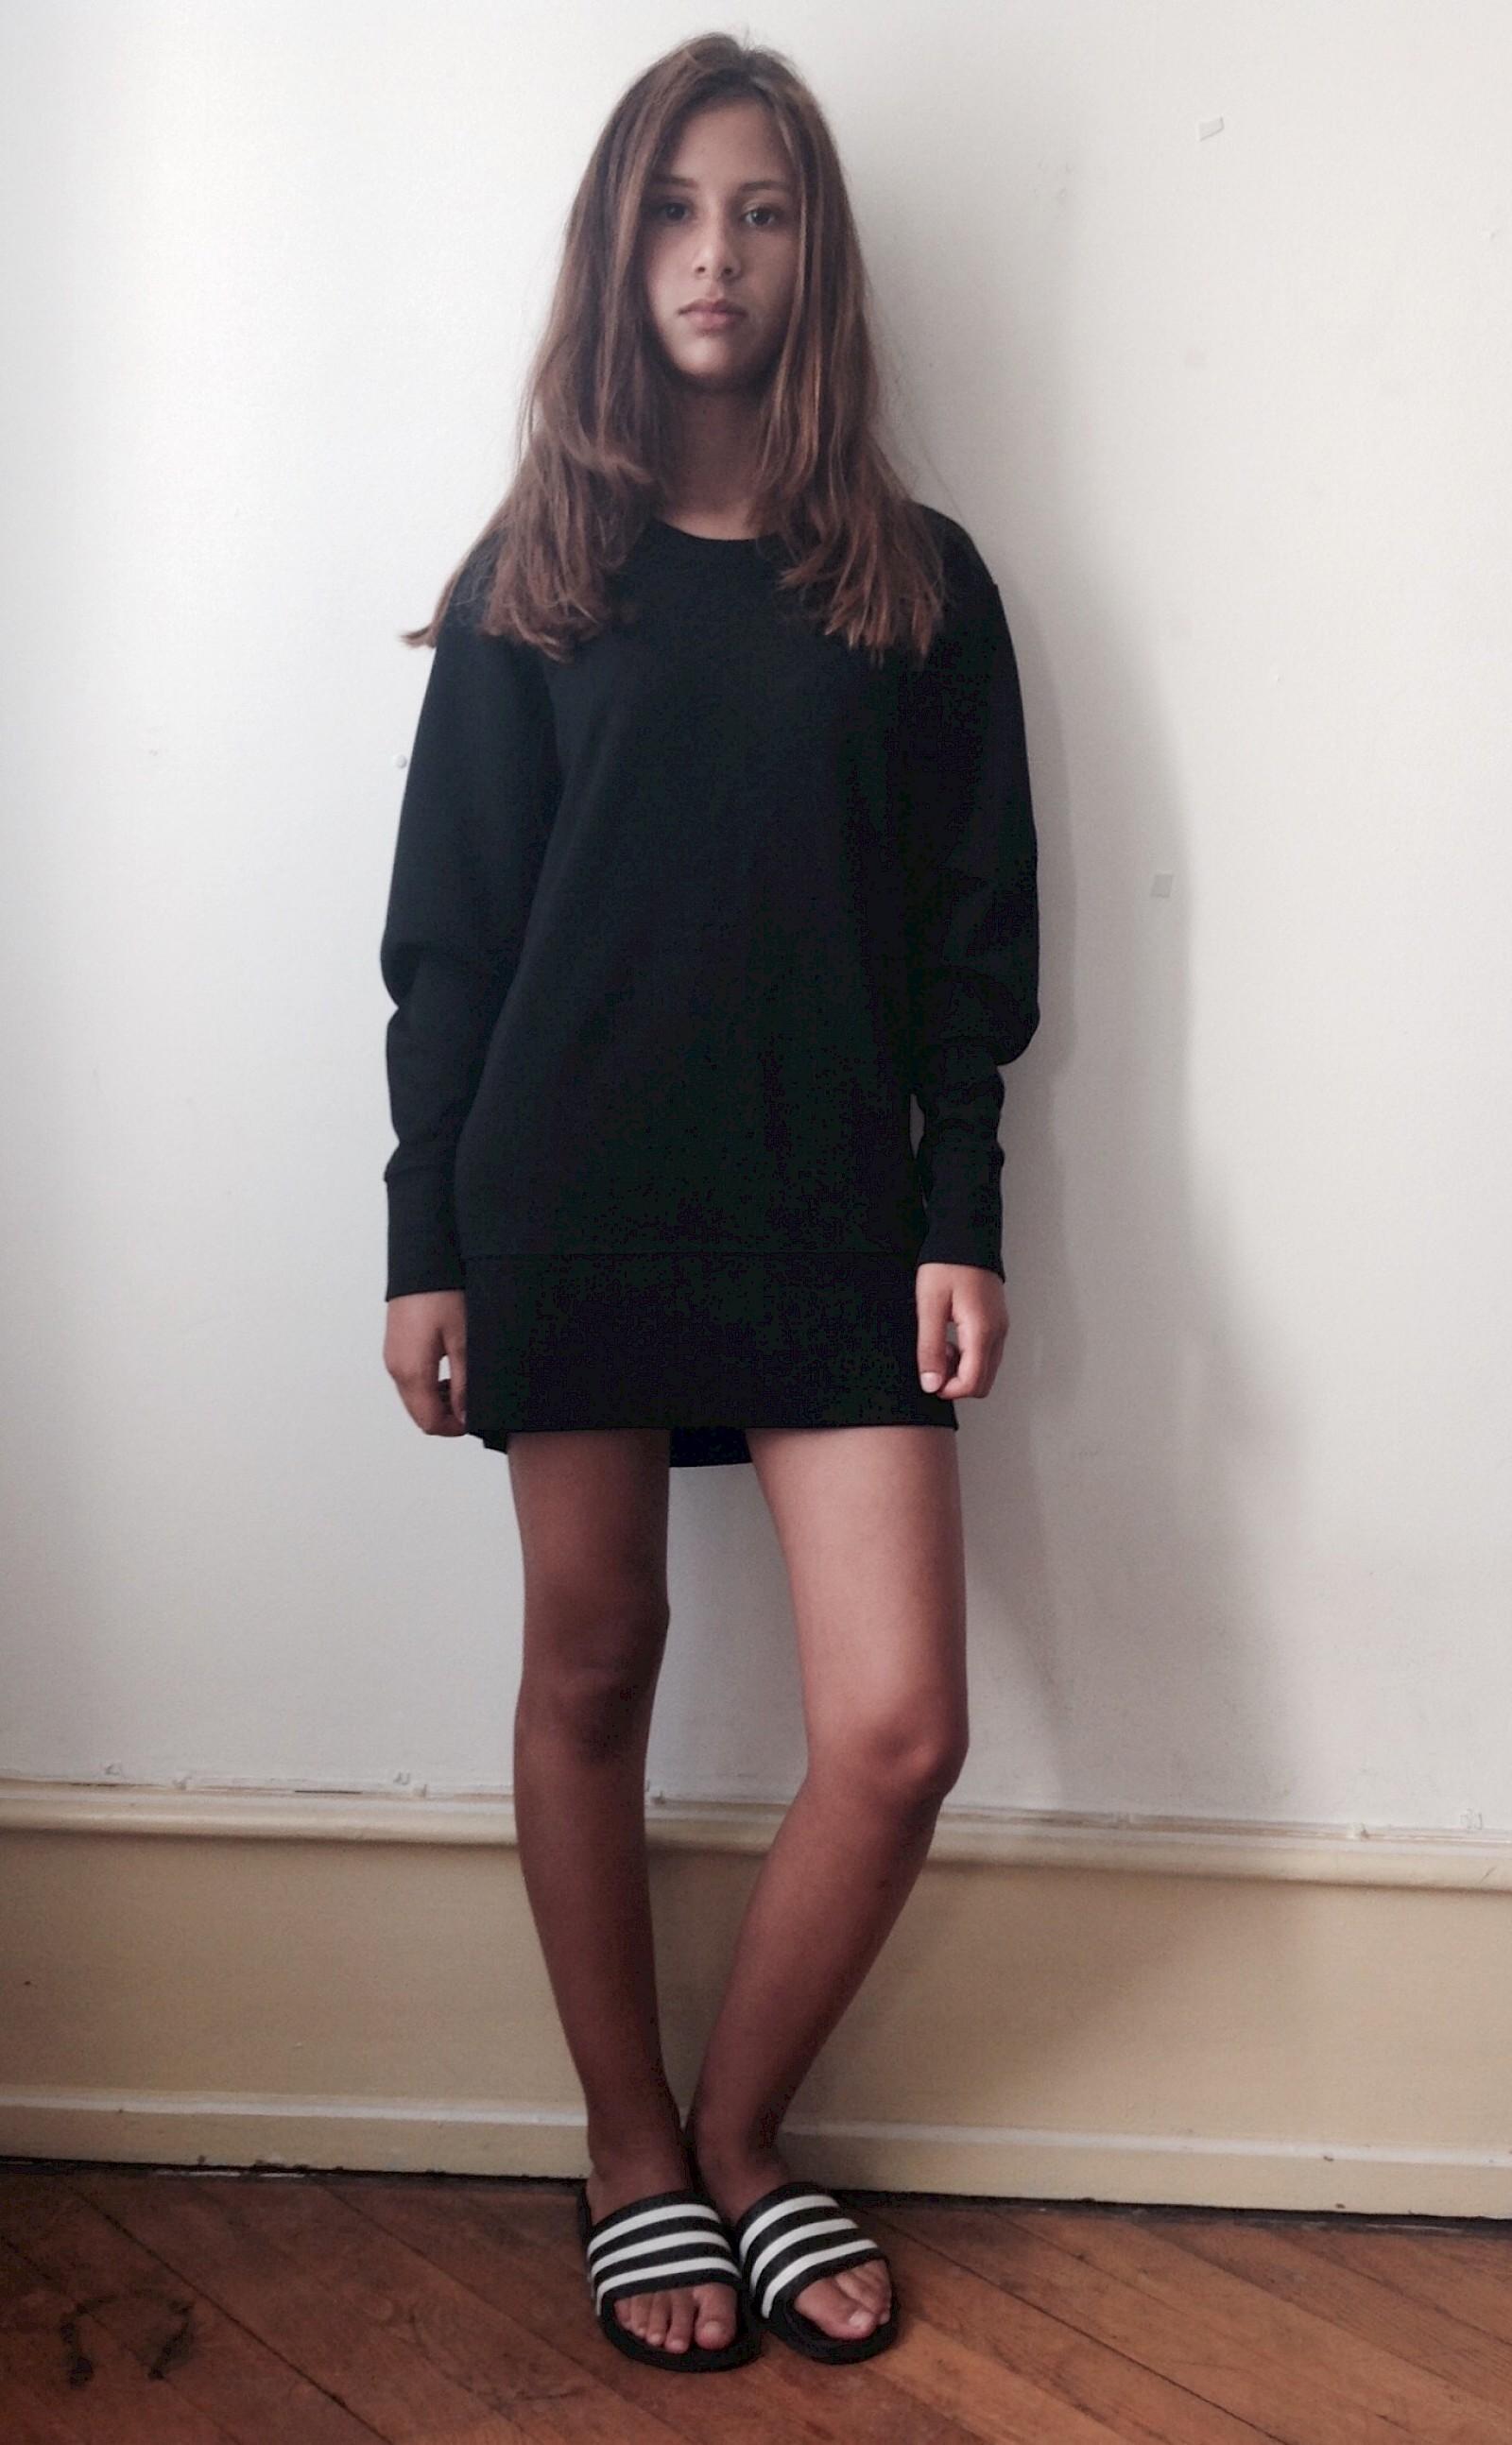 28ec6ac9e7b Basel Bazaar | LBD Helmut Lang oversized sweater dress Adilettes black